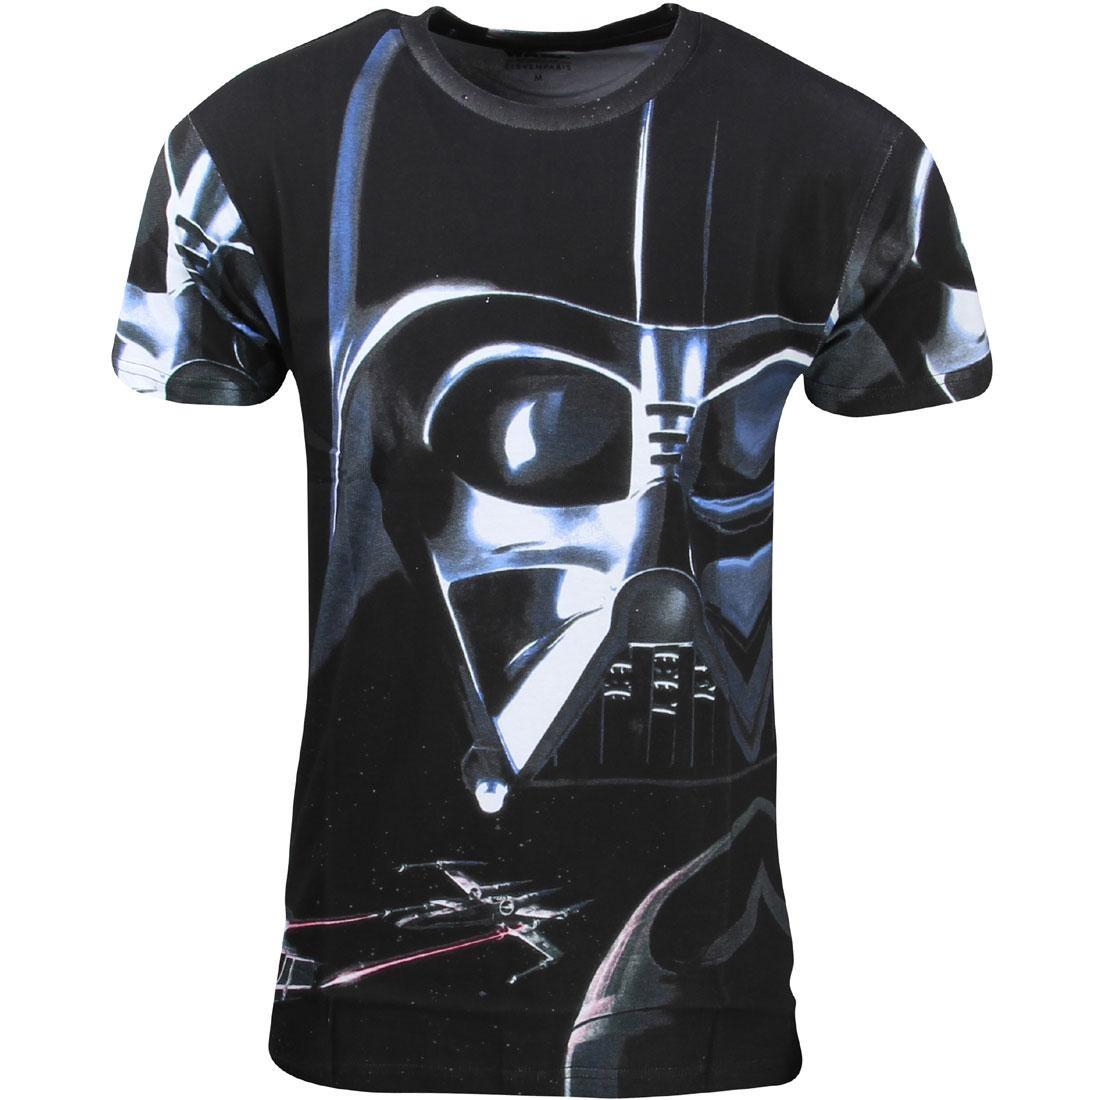 Tシャツ メンズファッション トップス カットソー メンズ 【 Eleven Paris X Star Wars Men Vader Staker Tee (black) 】 Black